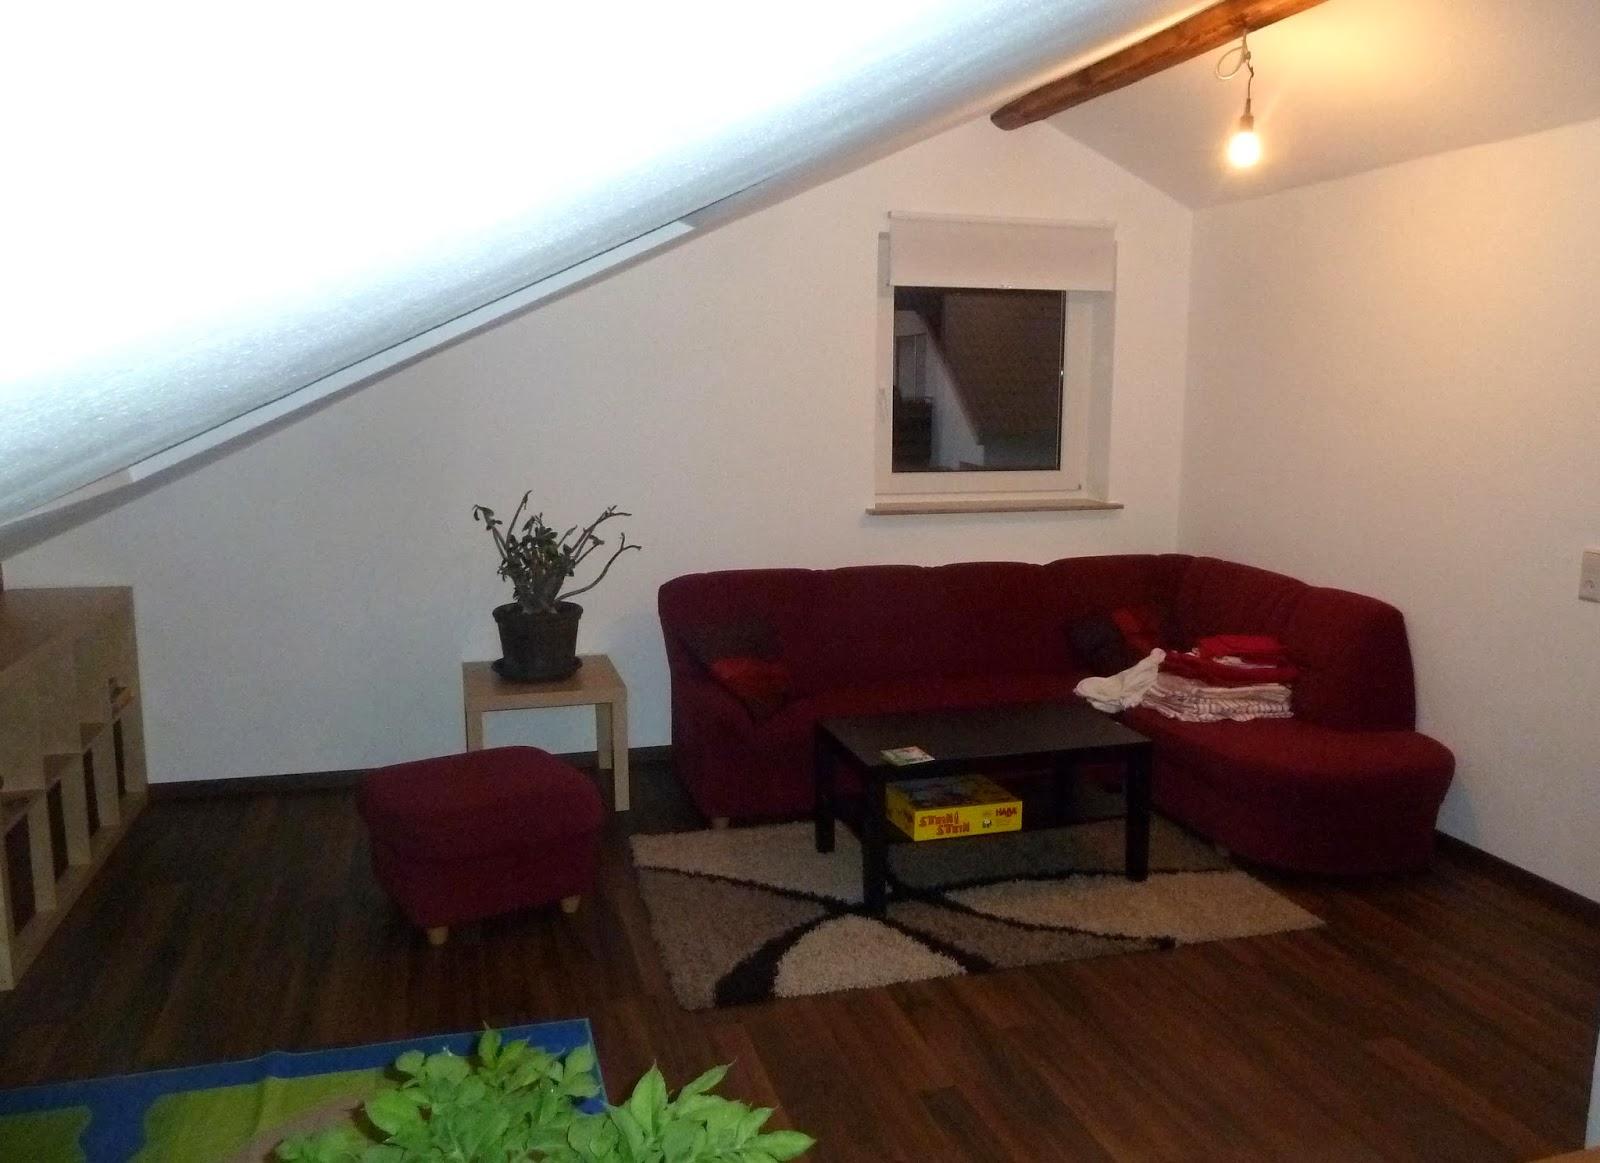 allt glich fertig fertig fertig. Black Bedroom Furniture Sets. Home Design Ideas